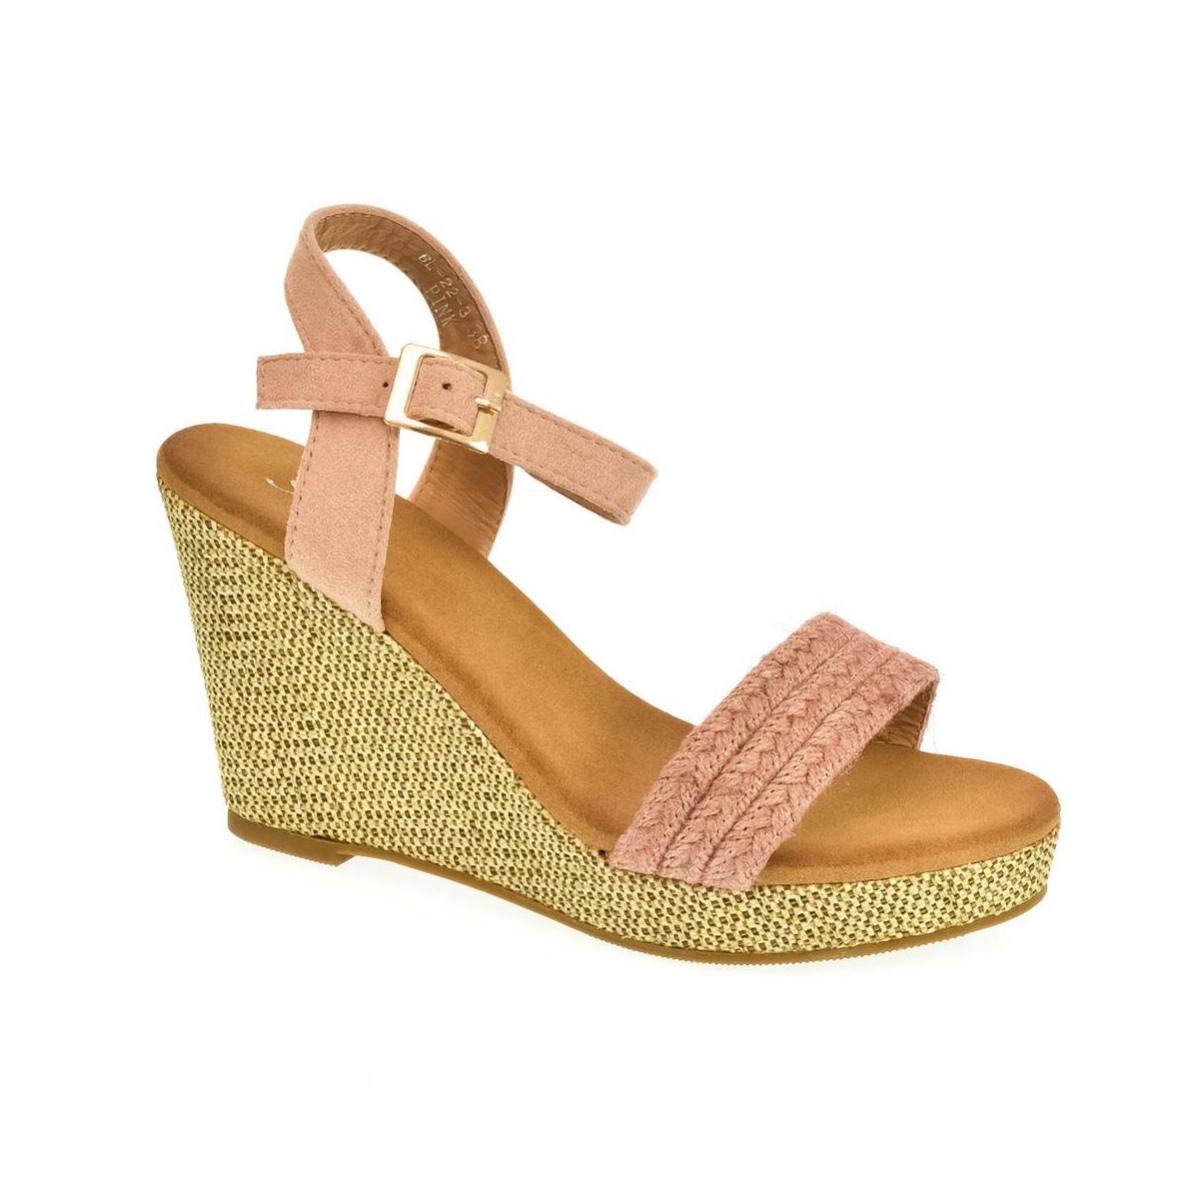 0067add3c Dámske ružové sandále BERIA   Johnc.sk